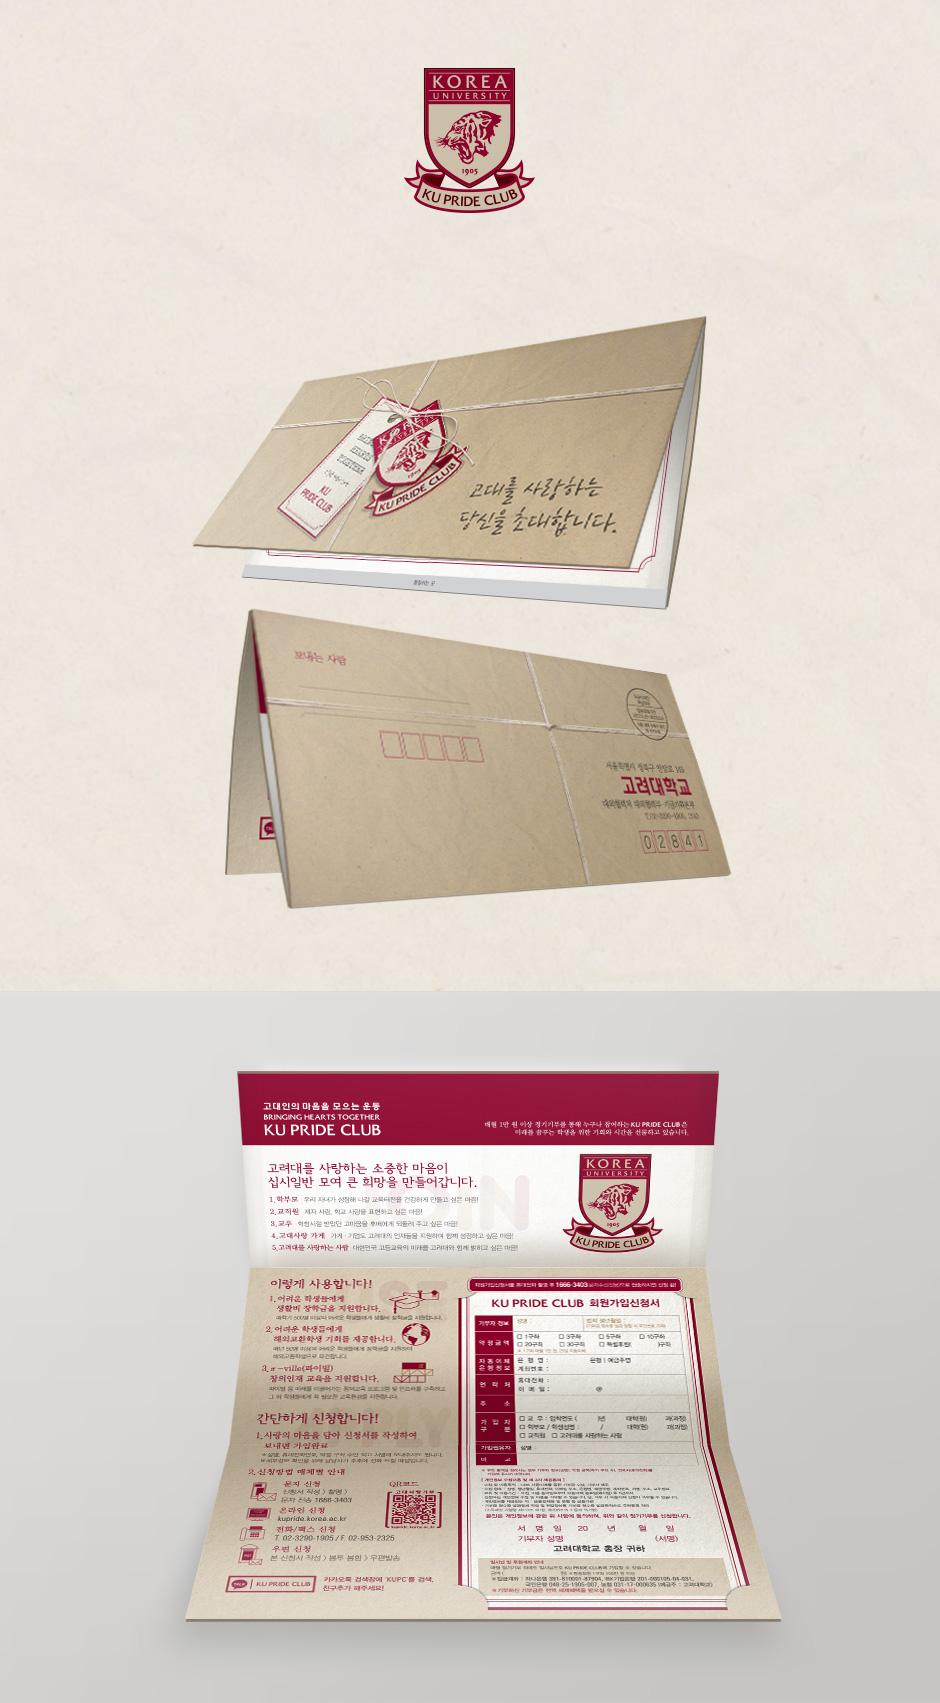 2018_Korea-University-Office-of-Development-and-External-Affairs-Ku-pride-club-leaflet_01